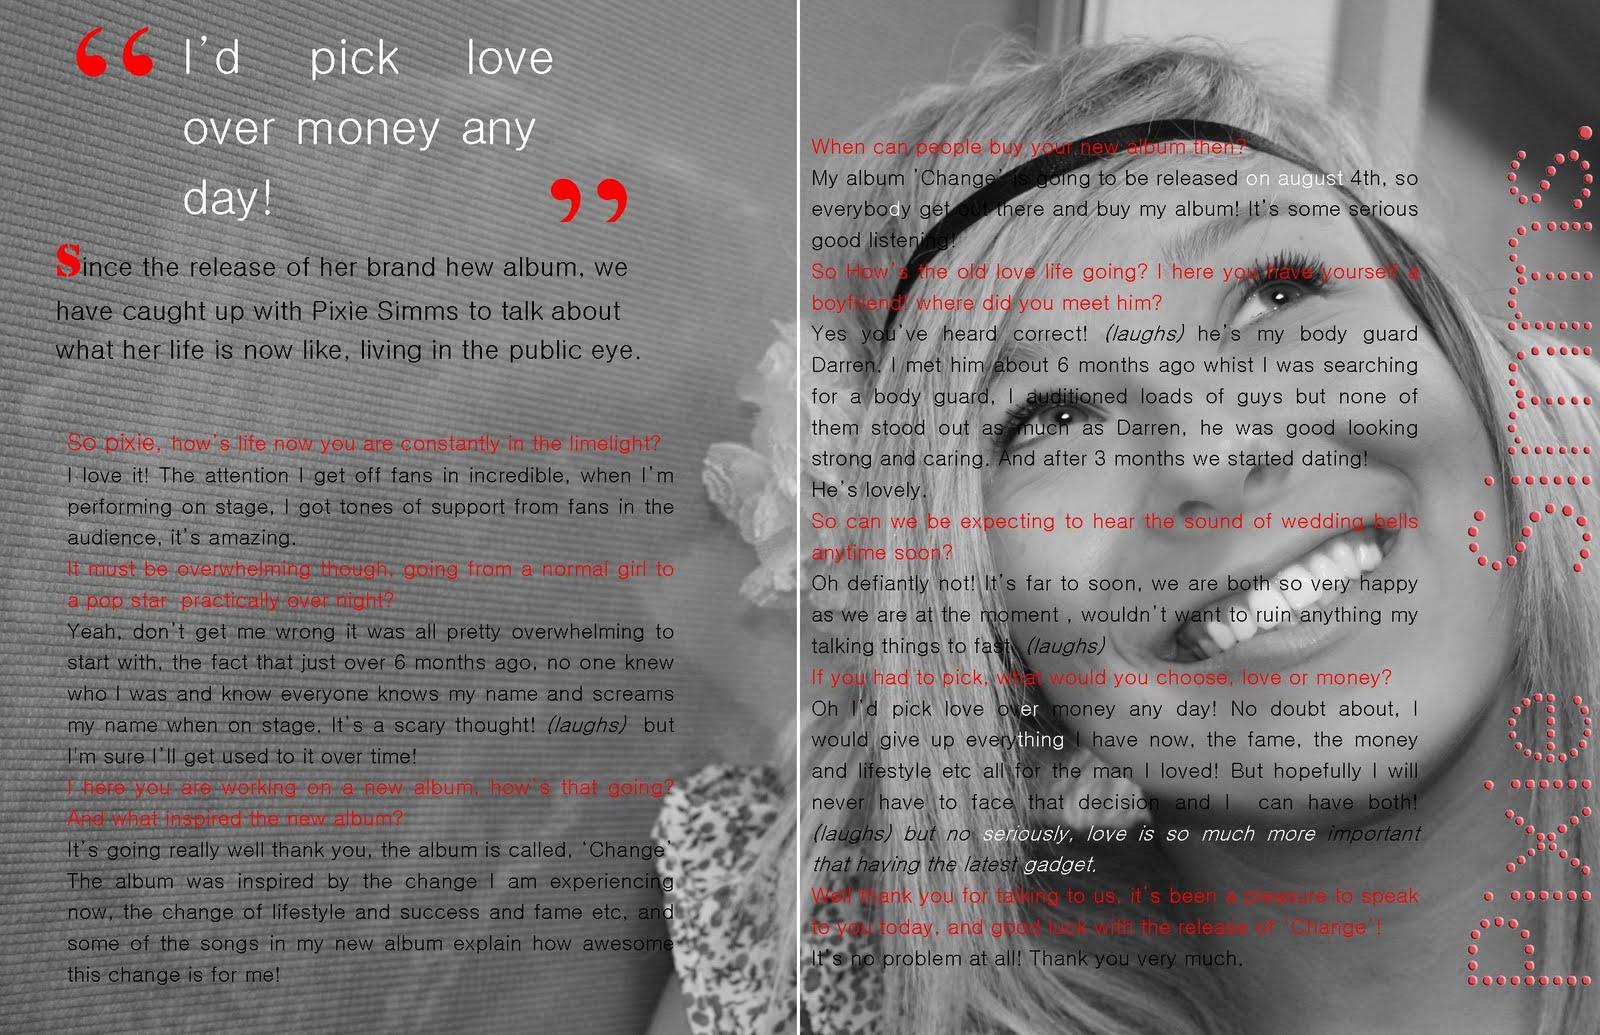 Design context magazine layout analysis - Double bad design ...